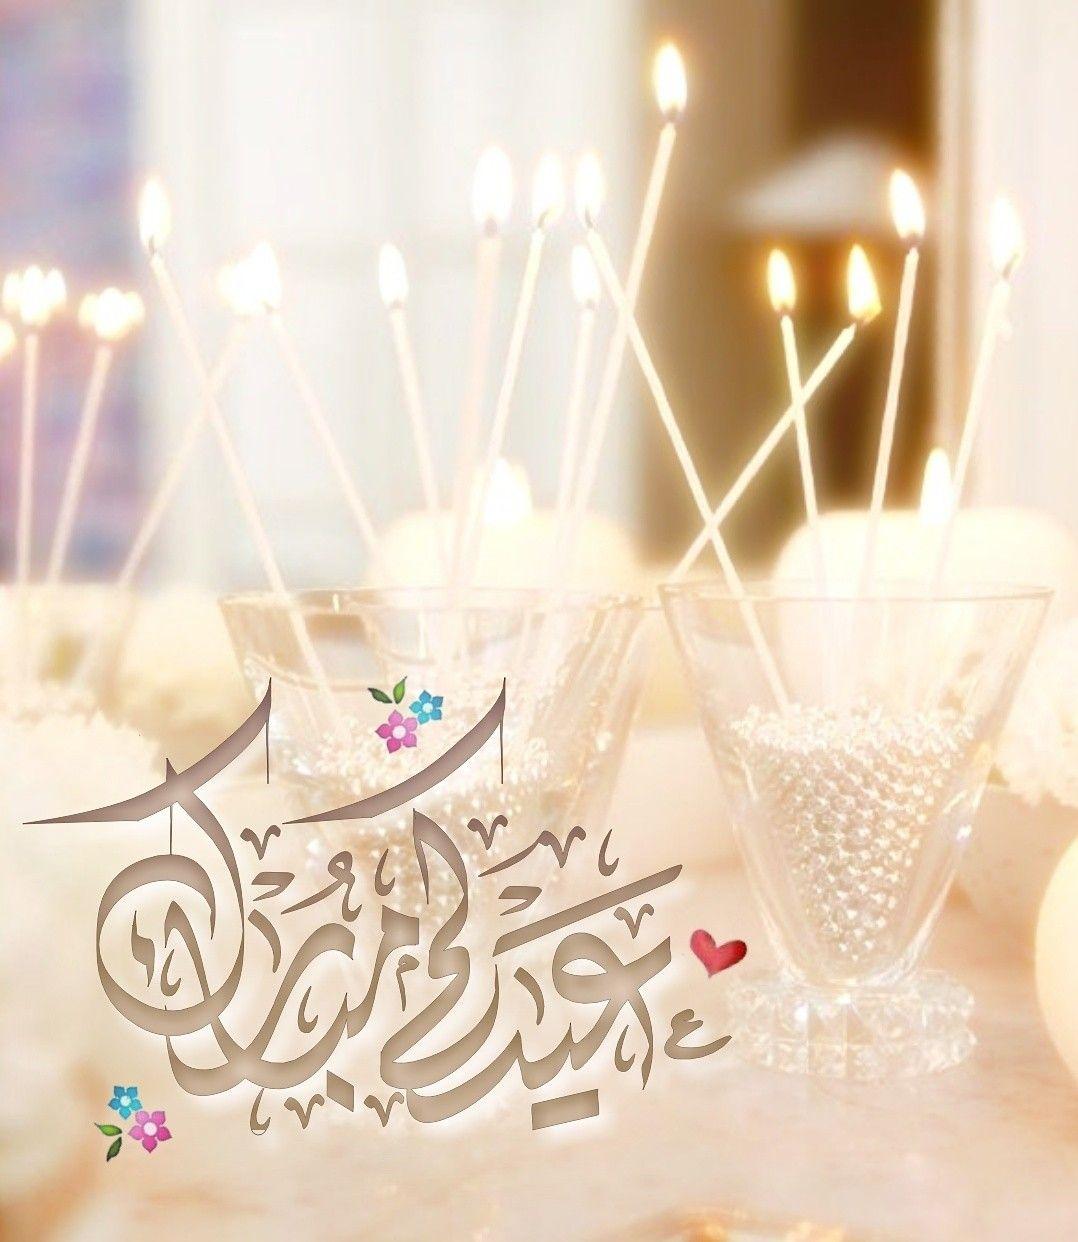 Pin By رمزيات إسلامية On عيدكم مبارك Eid Cards Eid Greetings Eid Mubarik